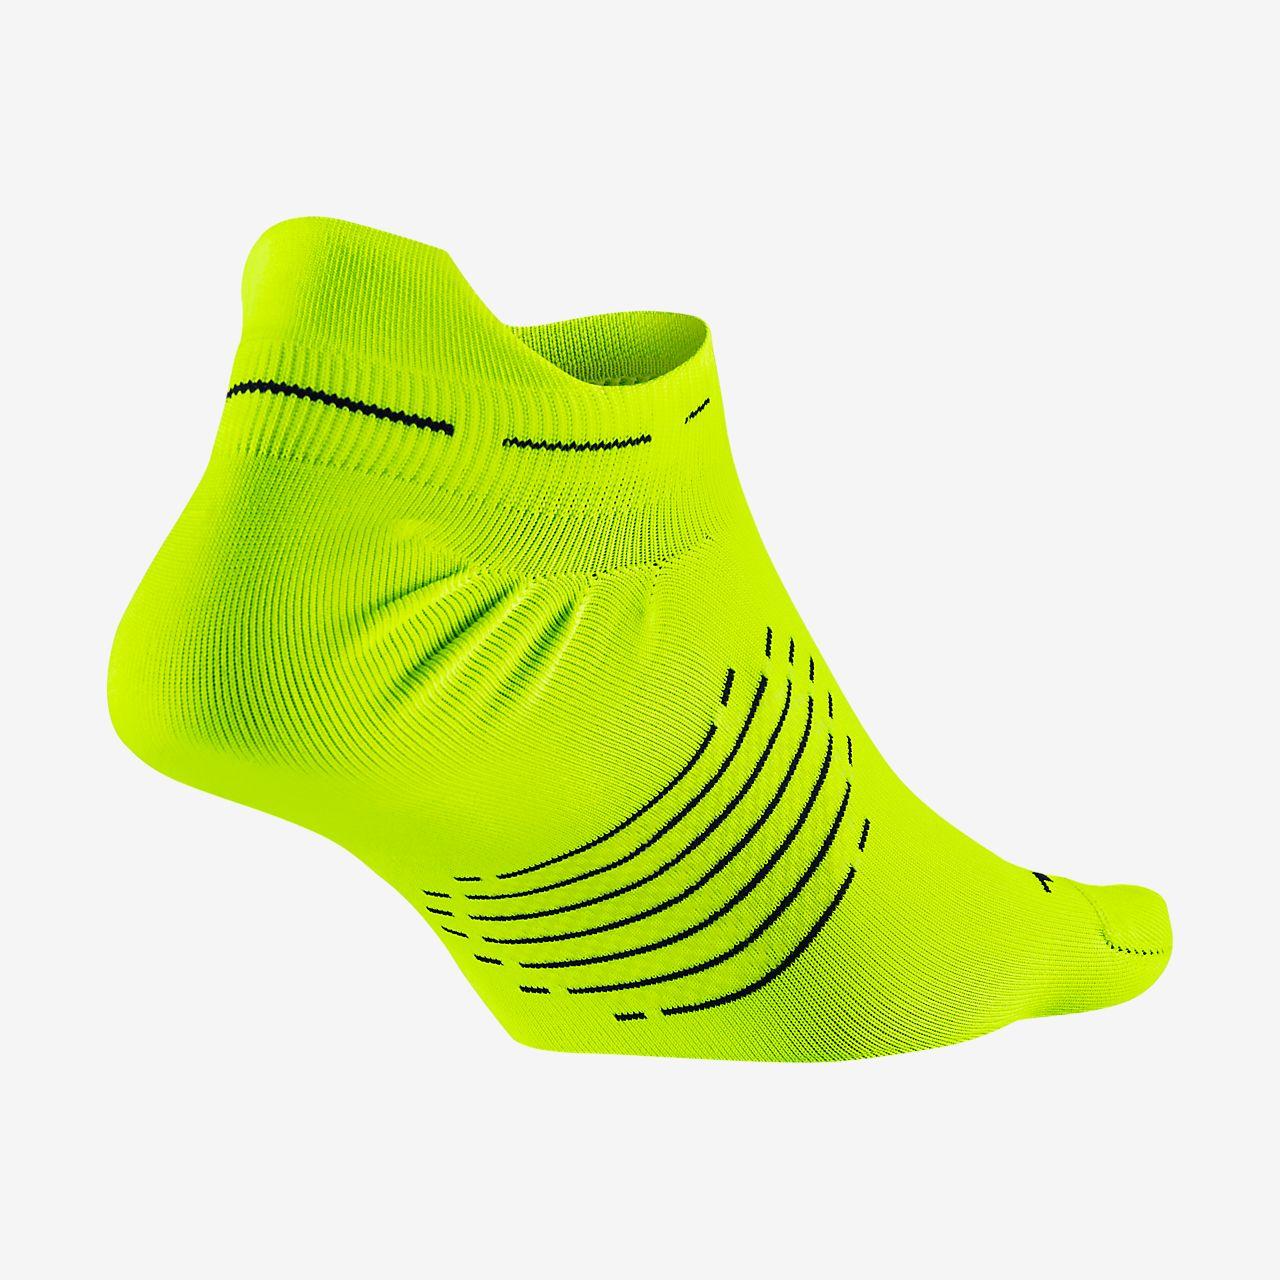 43fc84298f32 Nike Elite Lightweight No-Show Tab Running Socks. Nike.com CA